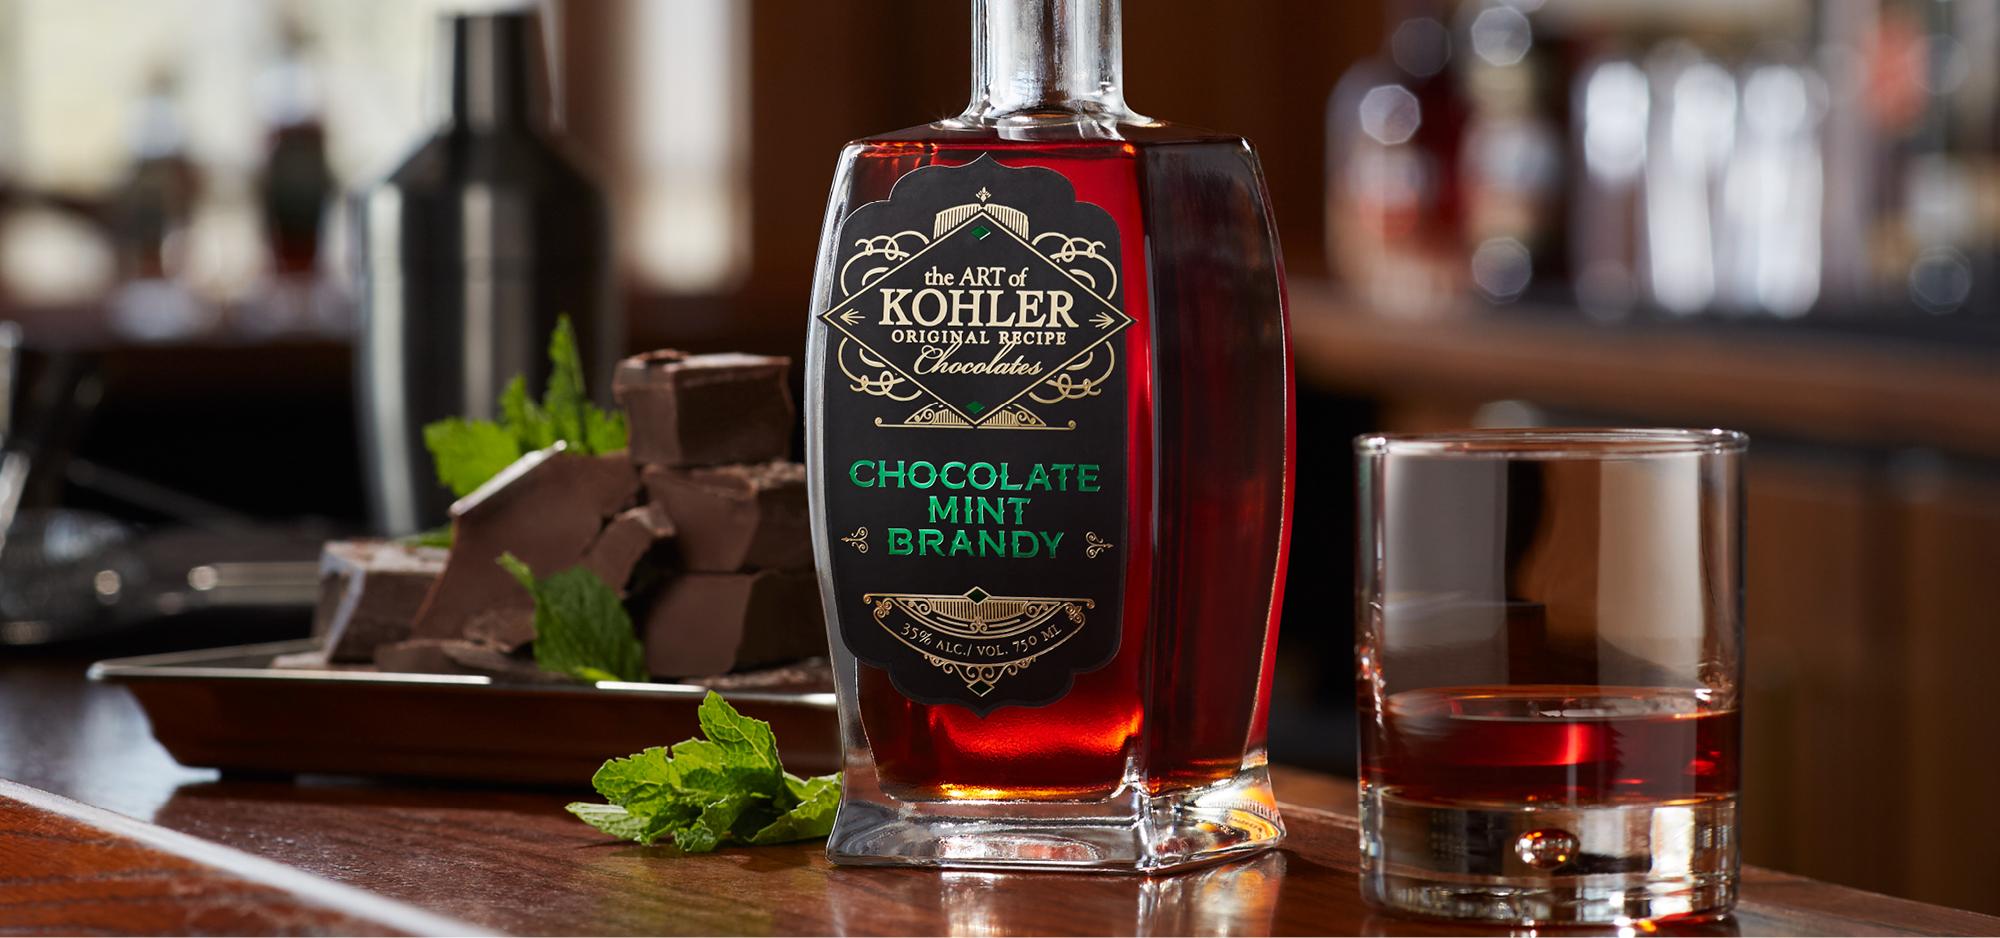 Kohler Original Recipe Mint Brandy